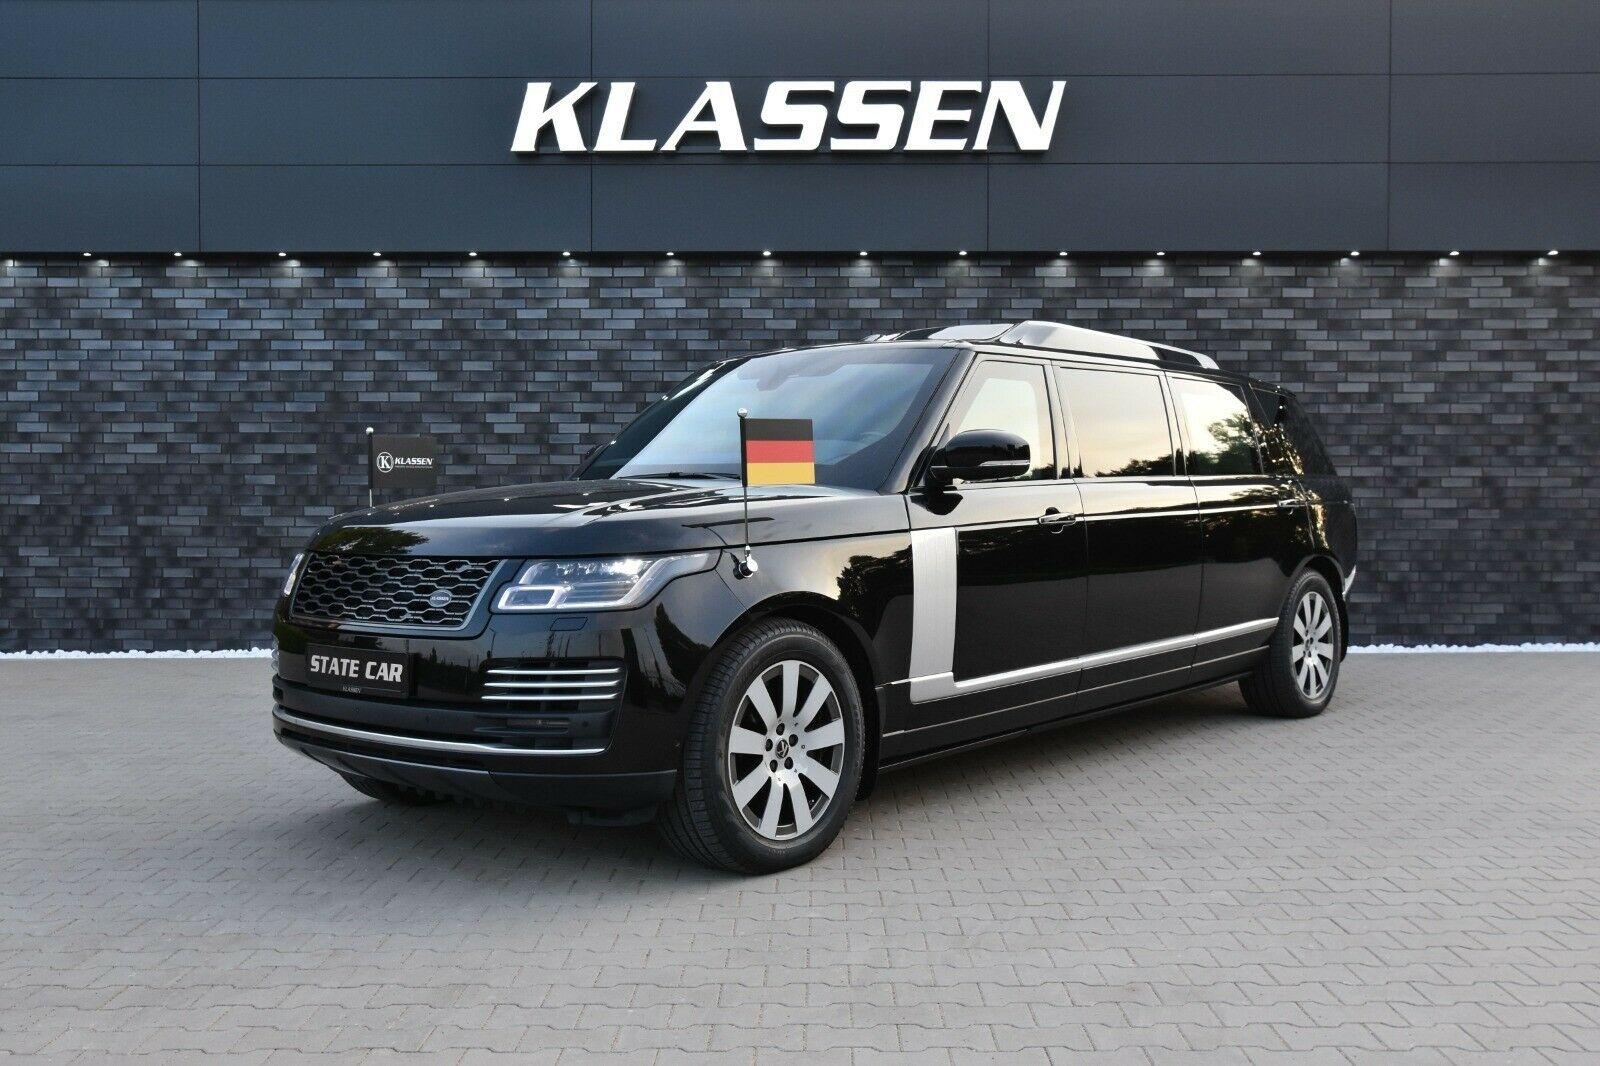 Range-Rover-SVAutobiography-by-Klassen-1